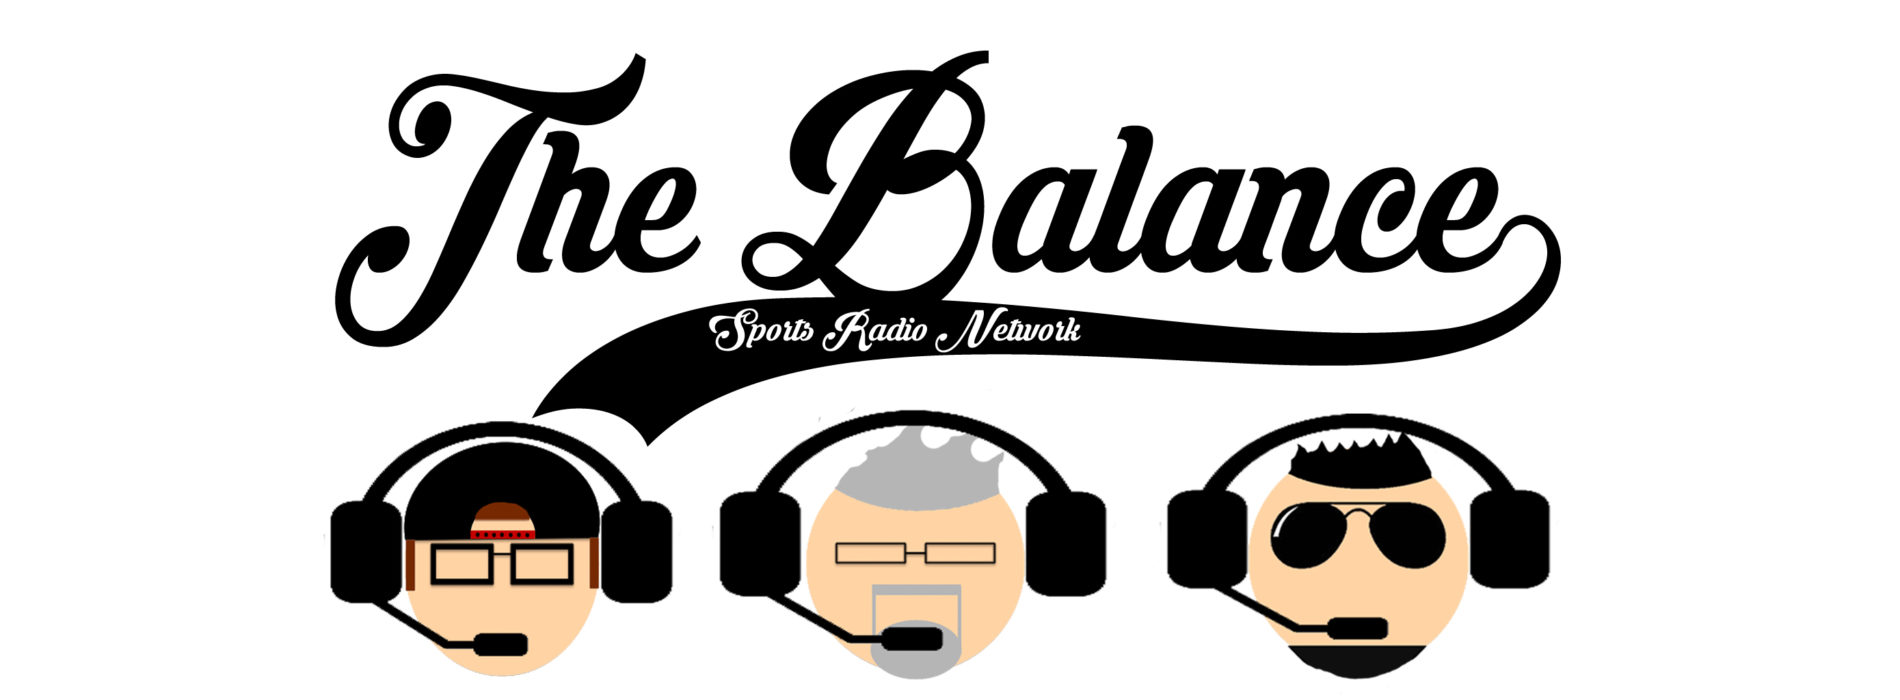 The Balance – January 2nd, 2016